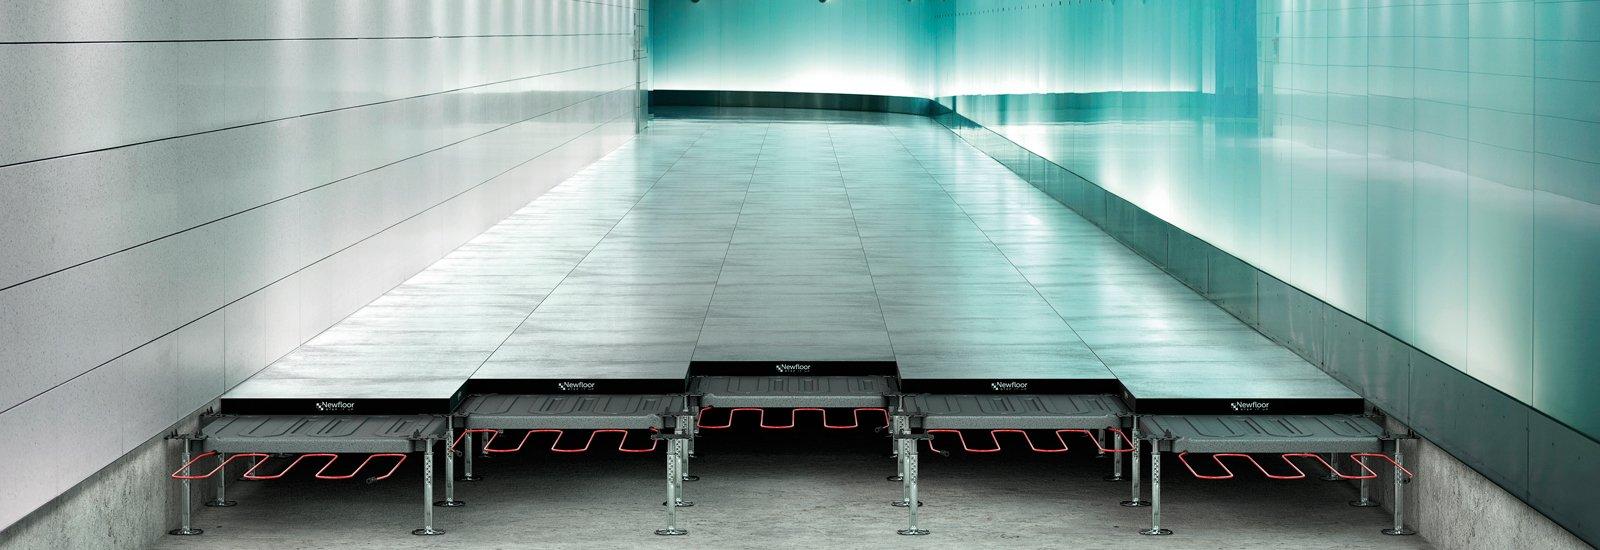 calidus pavimento galleggiante